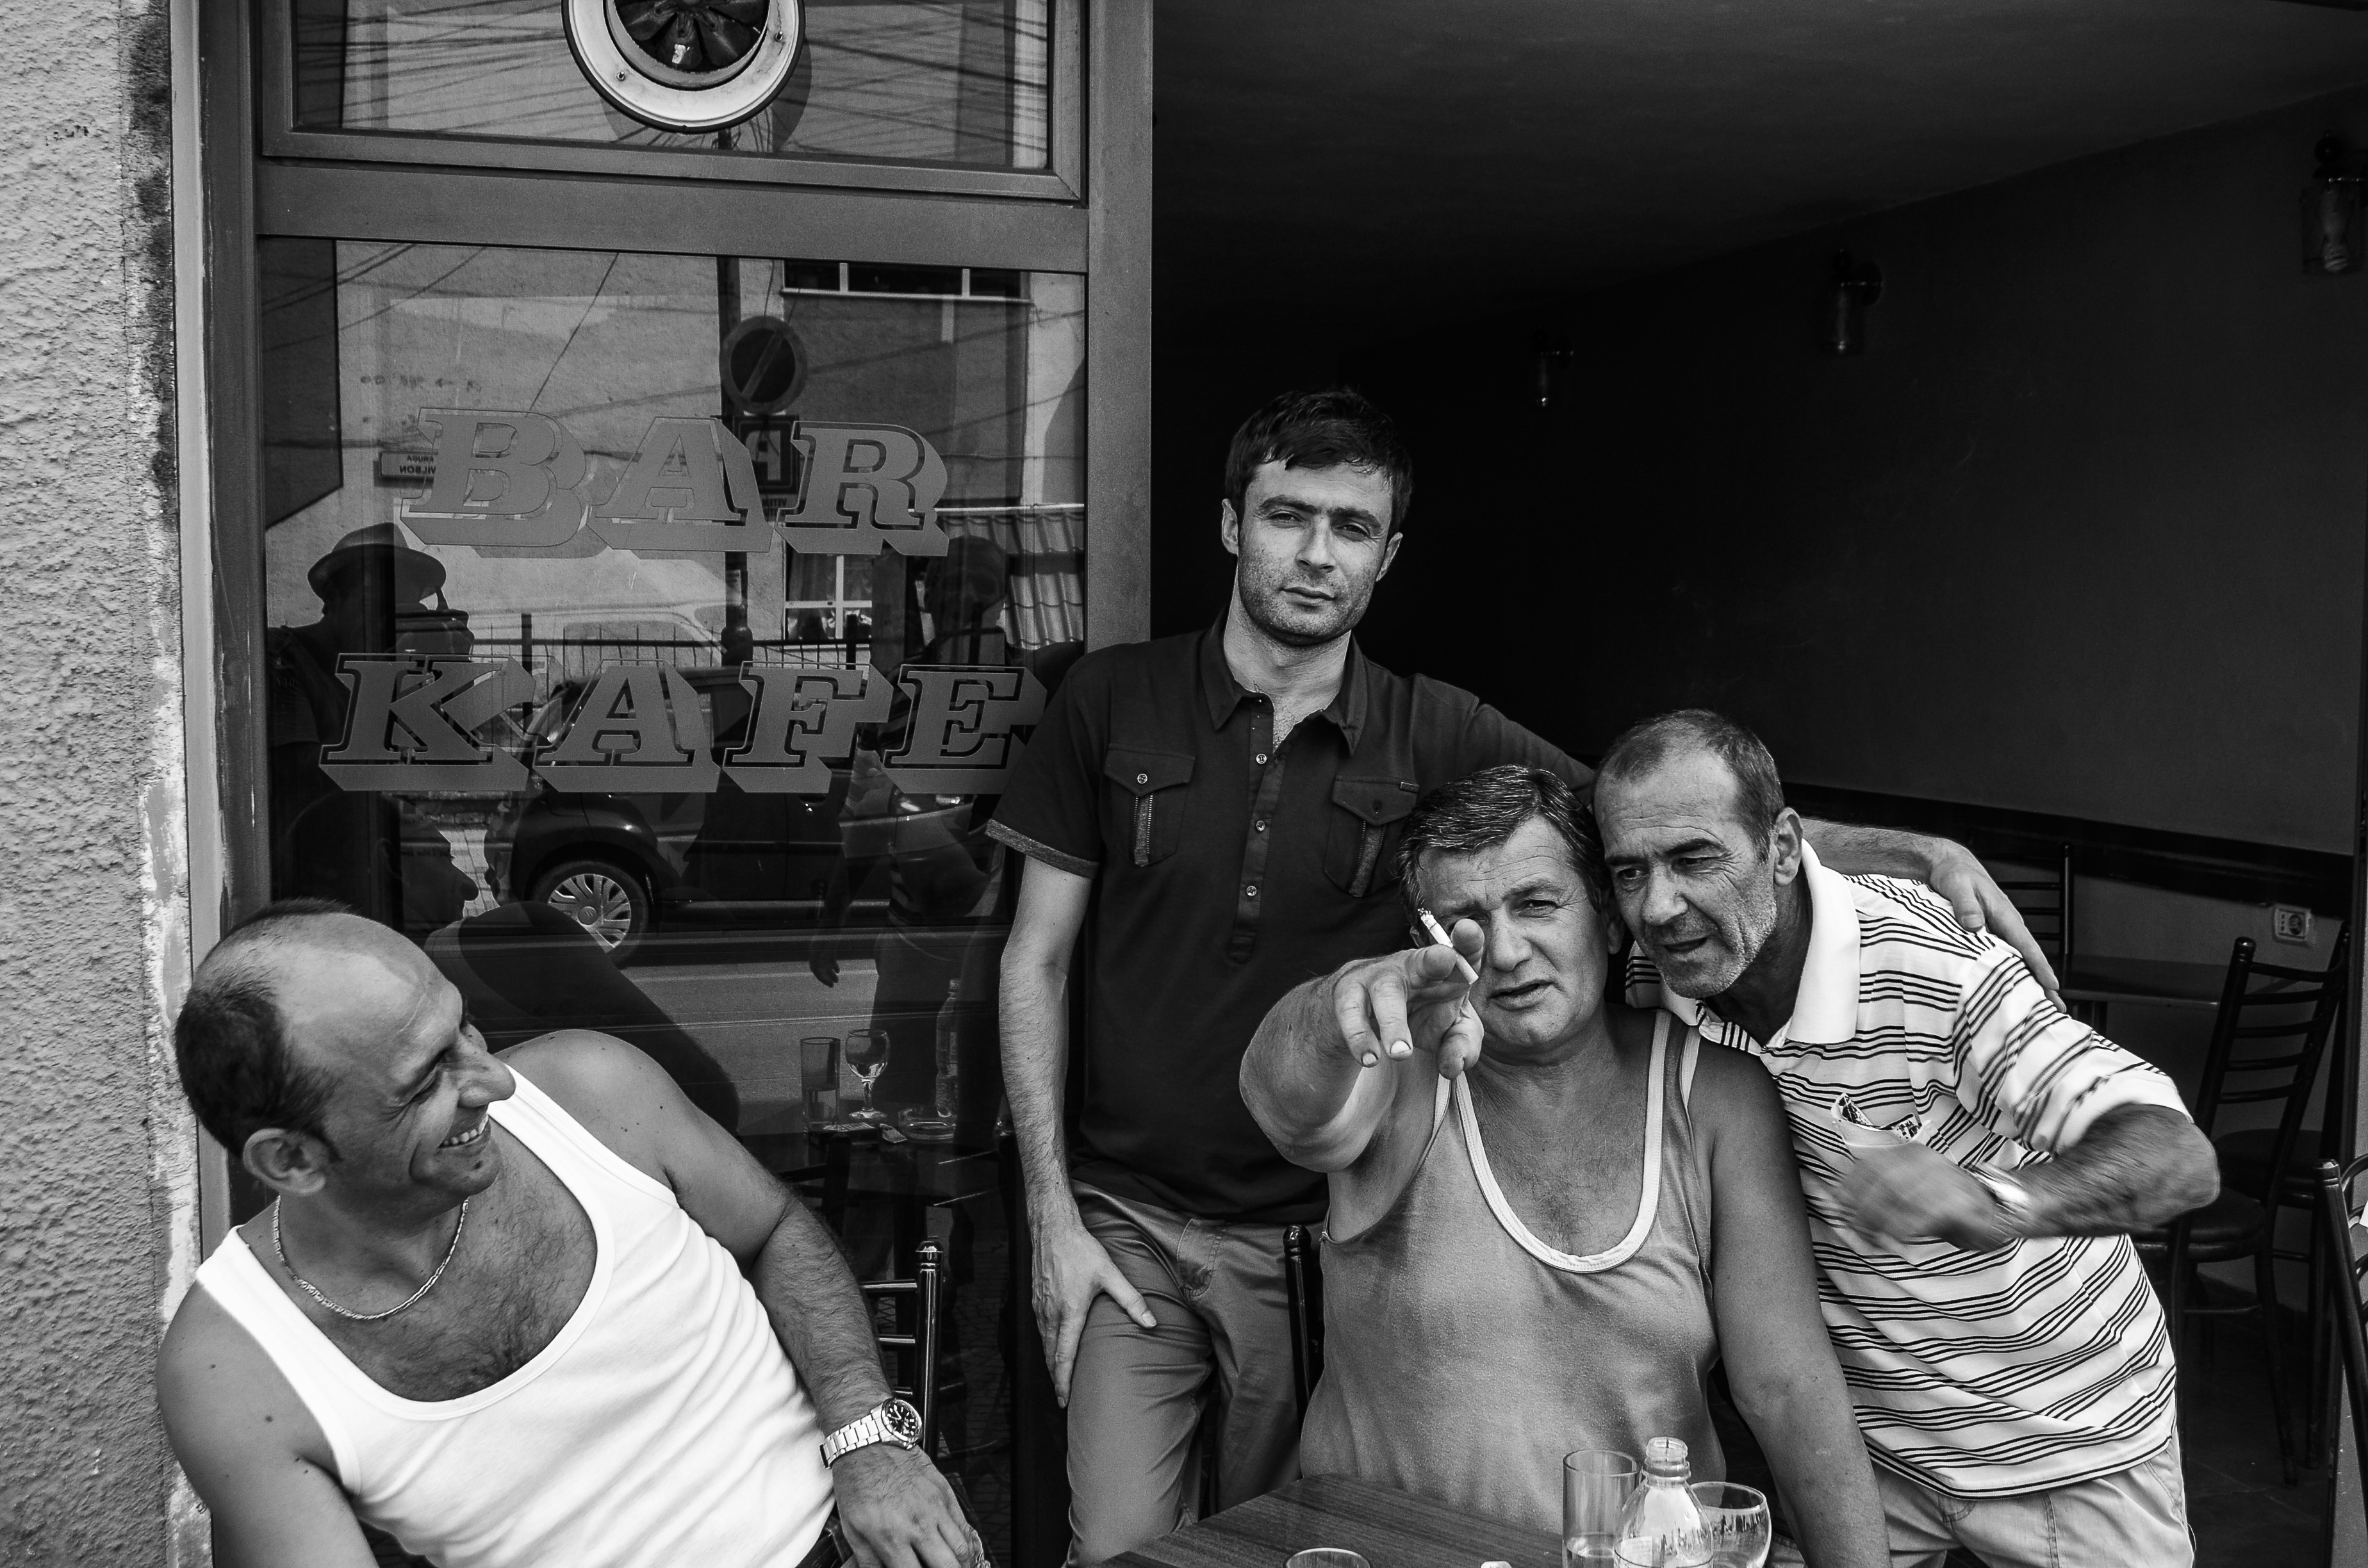 9-albanie-recontre-fortuite-a-shkodra